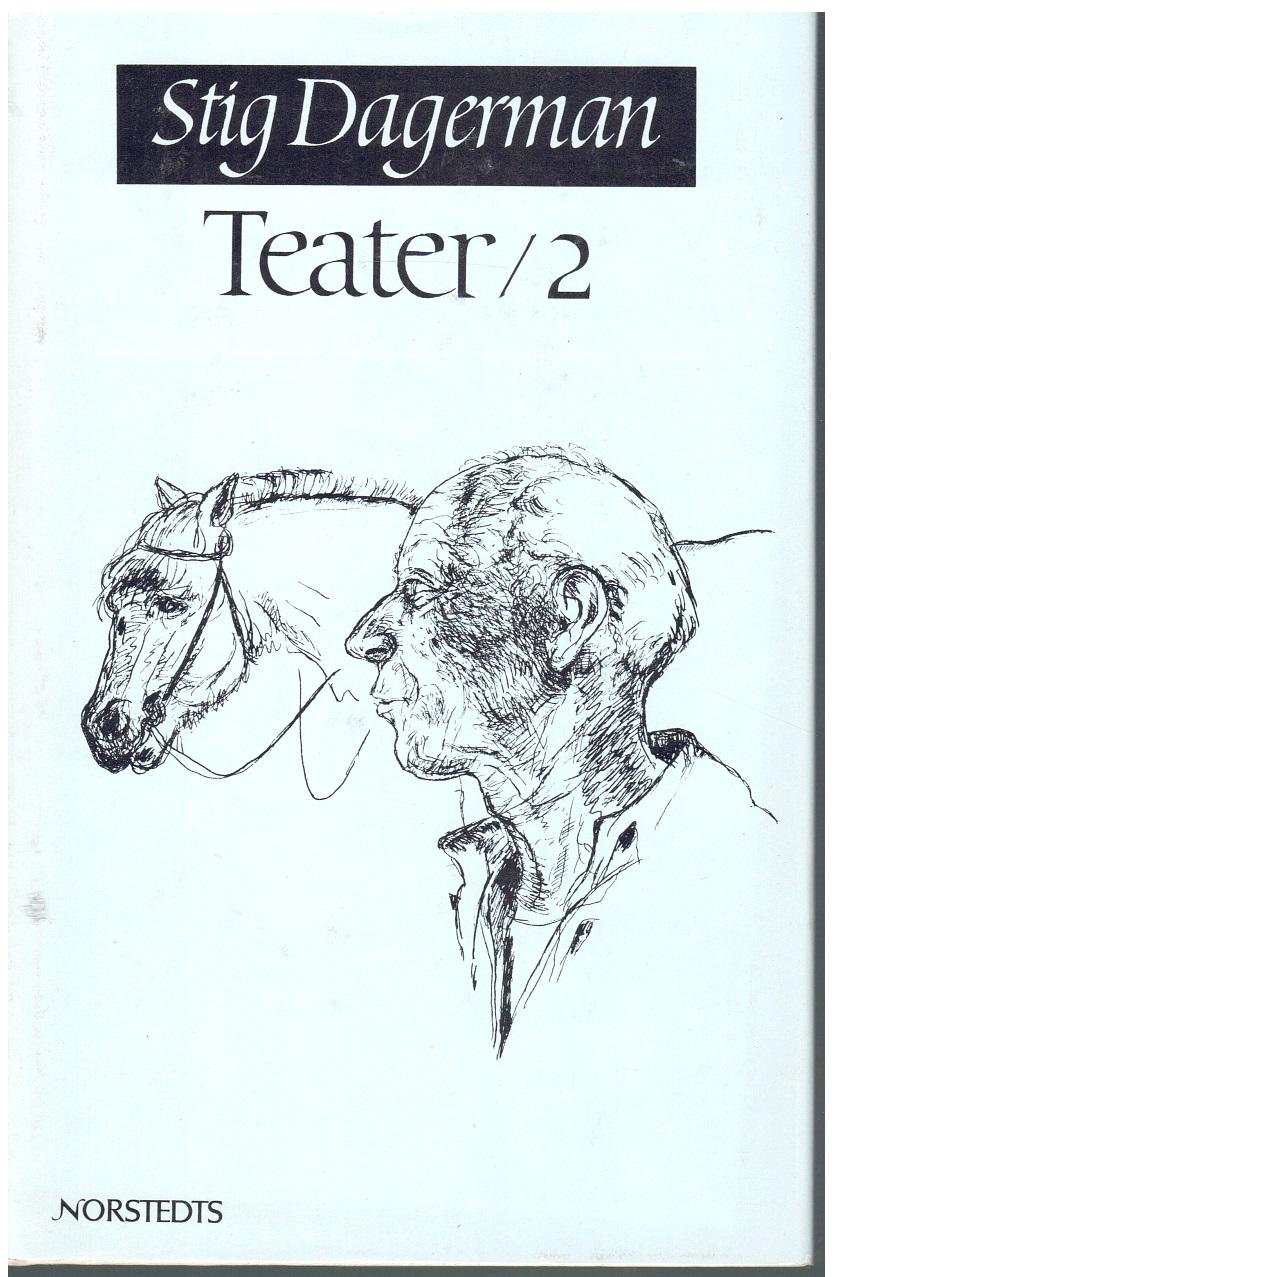 Samlade skrifter 7 Teater 2 - Dagerman, Stig